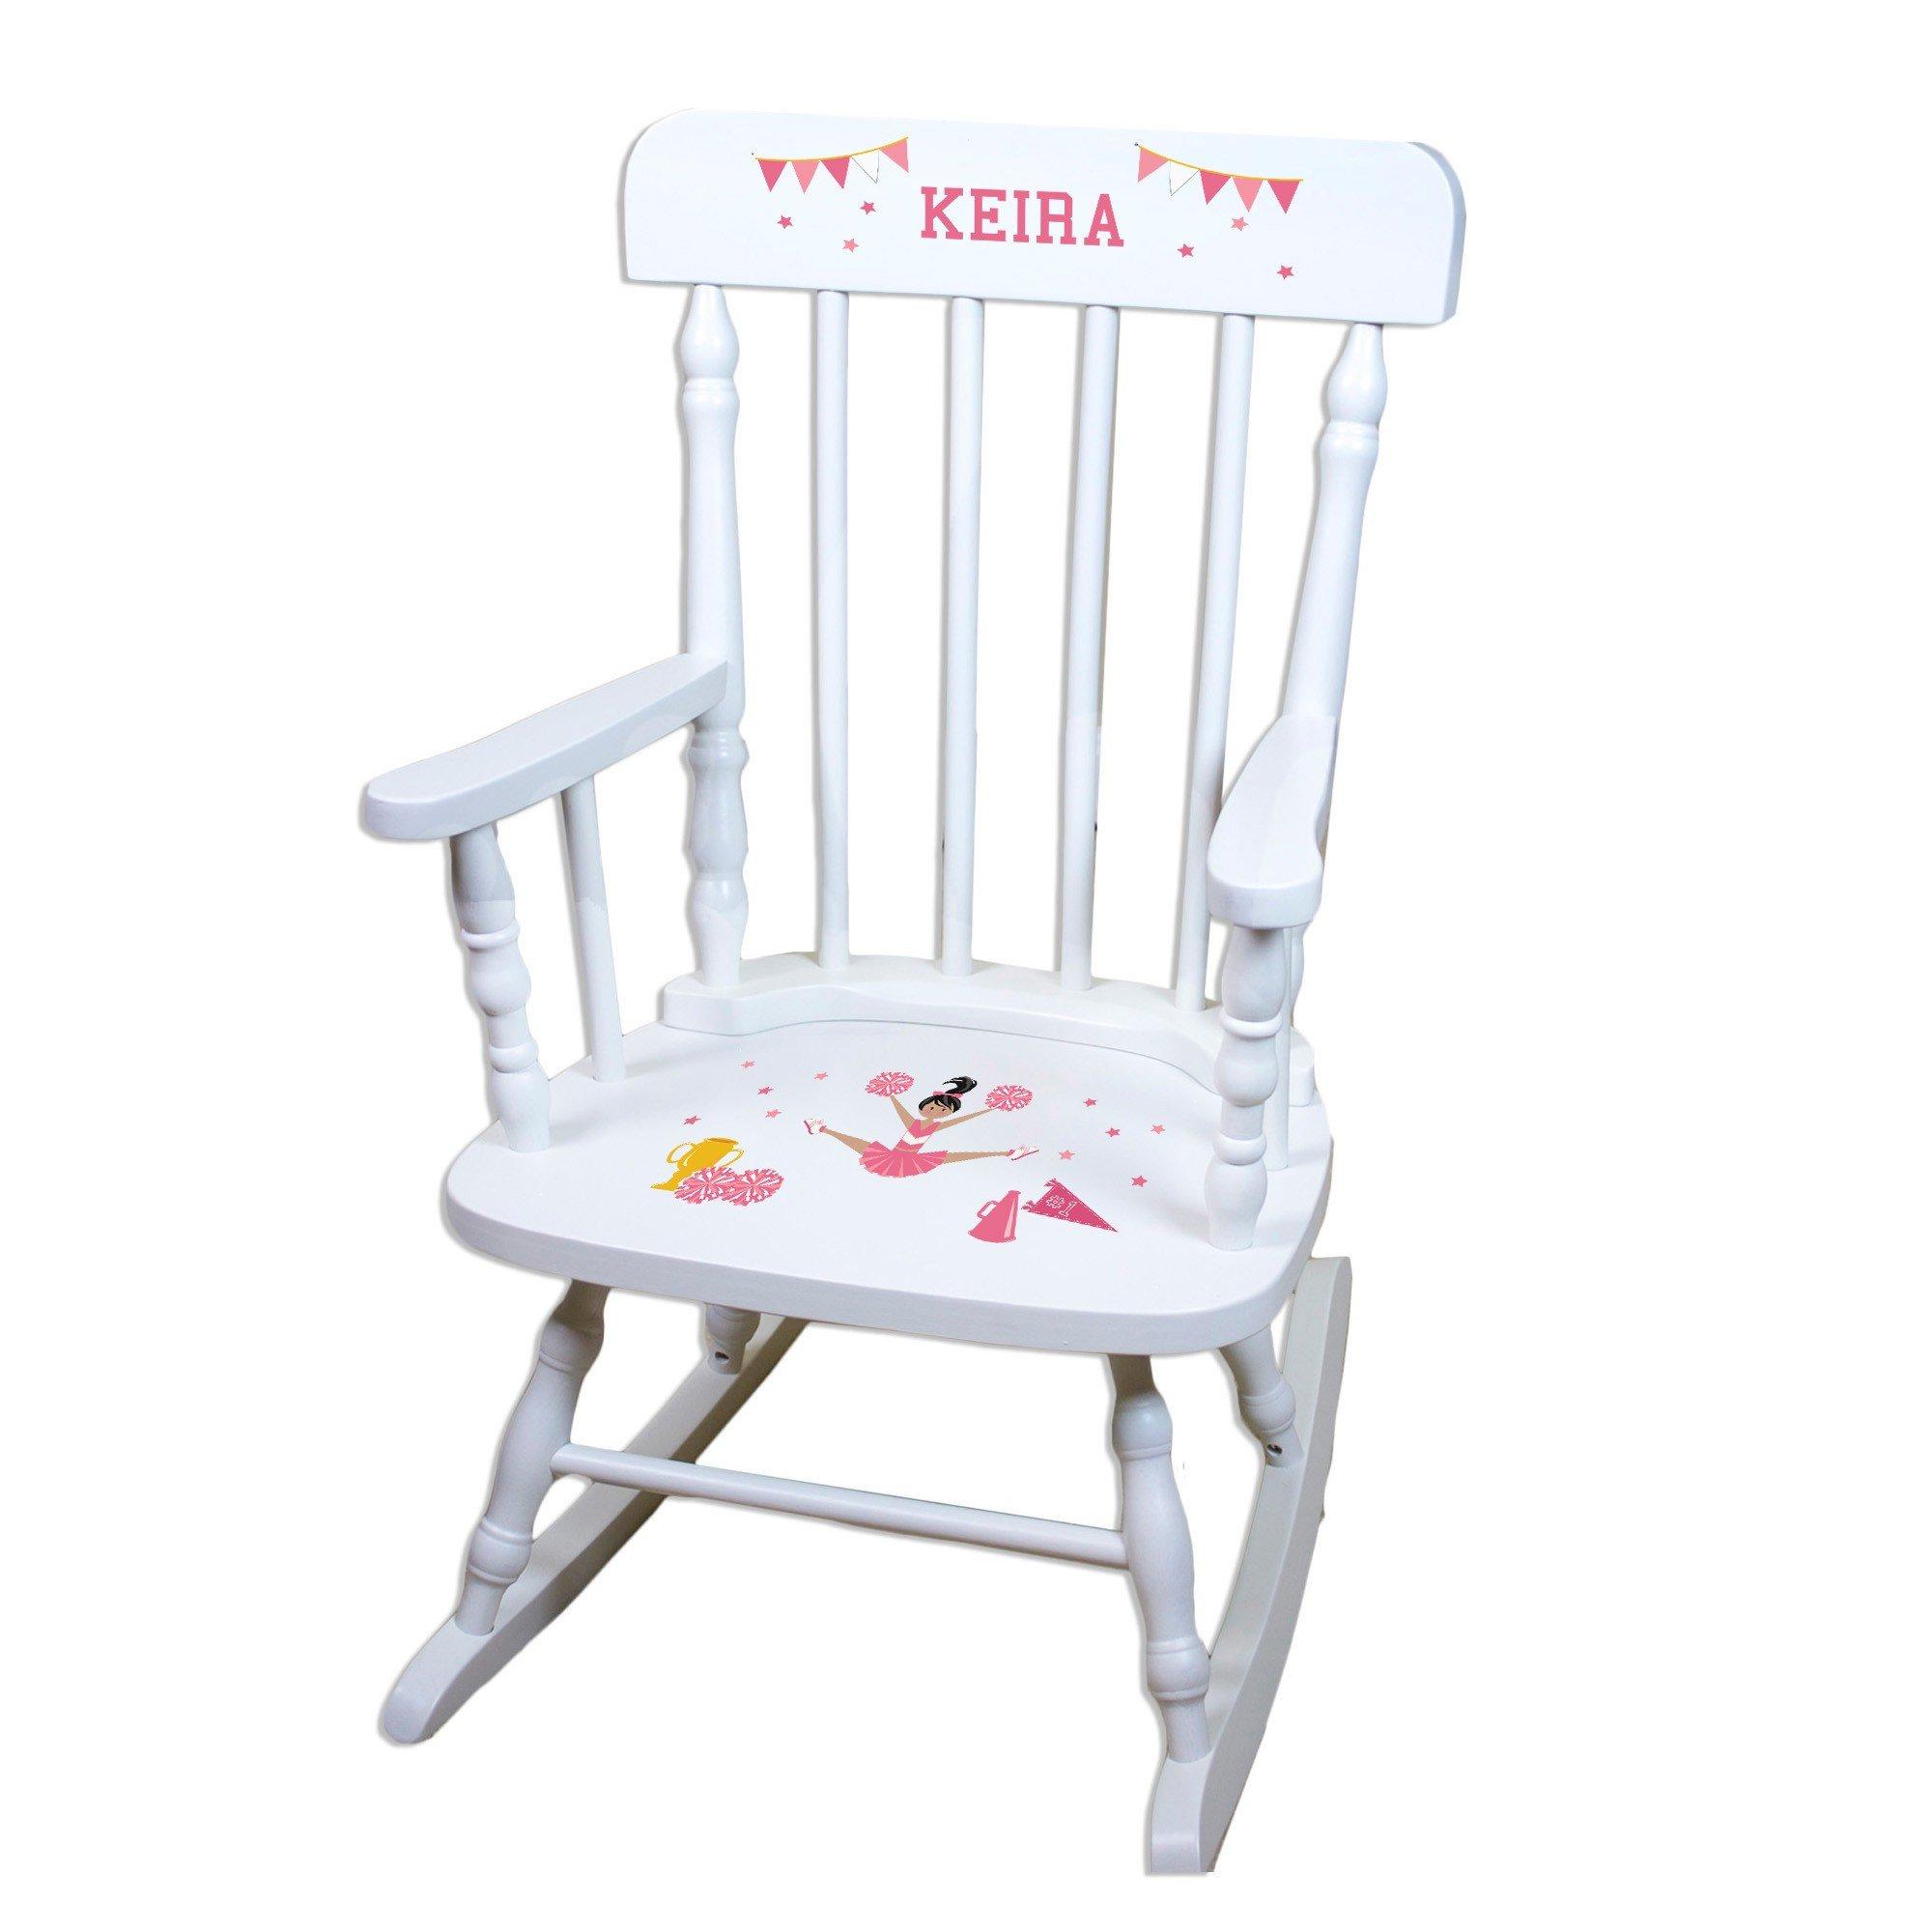 MyBambino Personalized Cheerleader Black Hair Pink White Wooden Childrens Rocking Chair